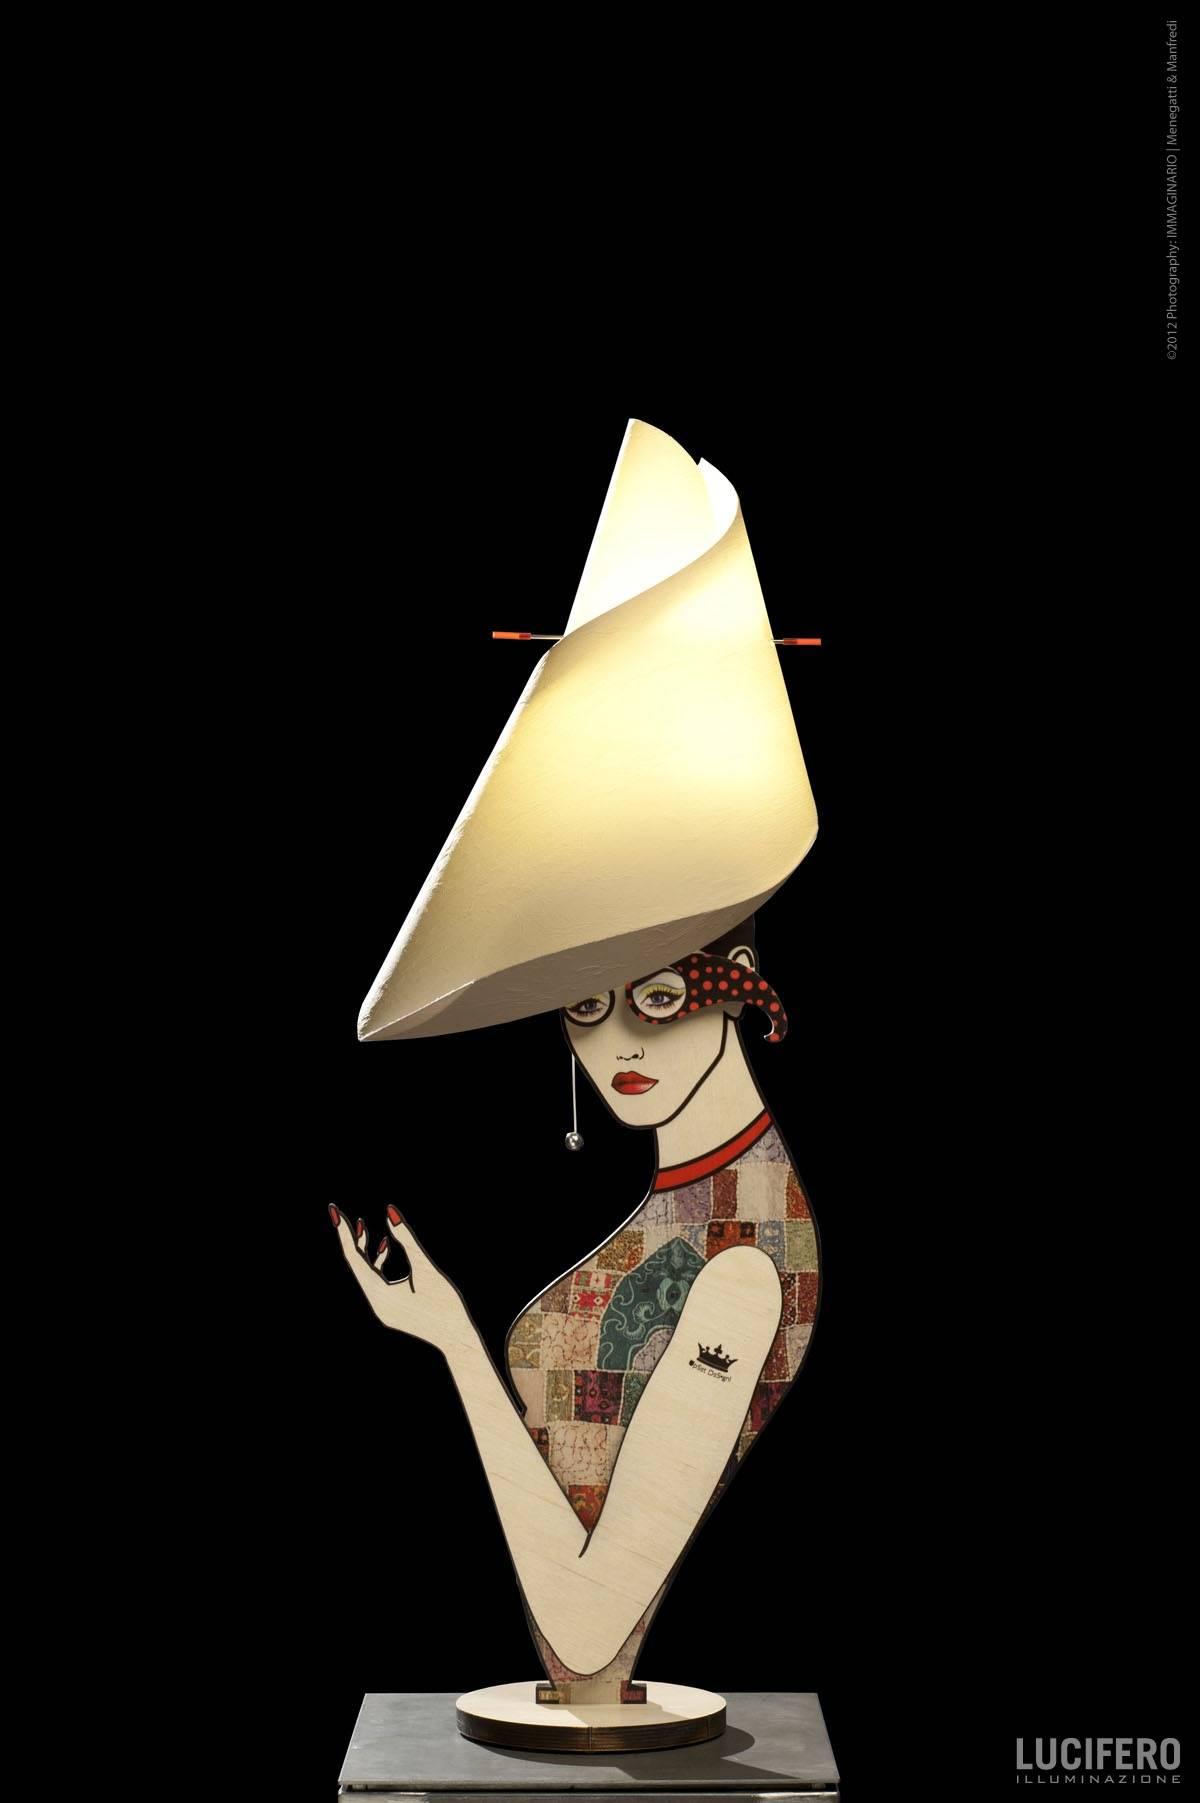 Lucifero Bella Table Lamp